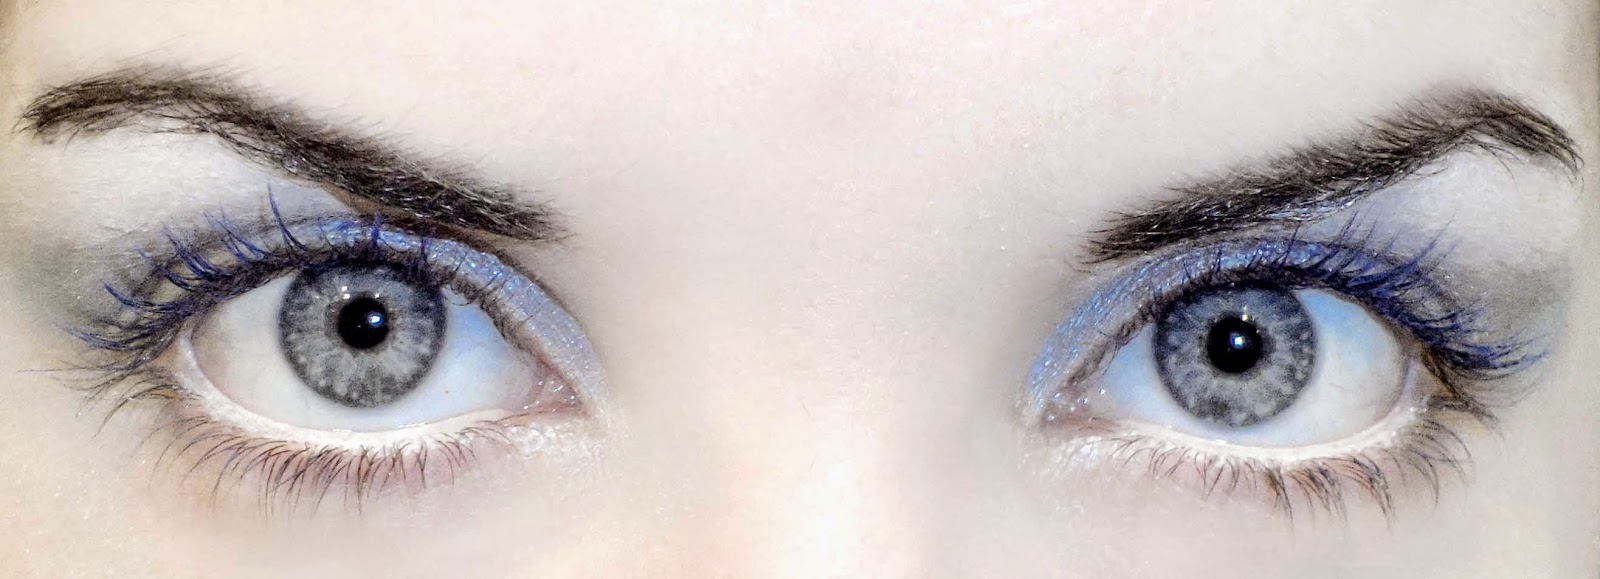 maquillaje para agrandar ojos paso a paso